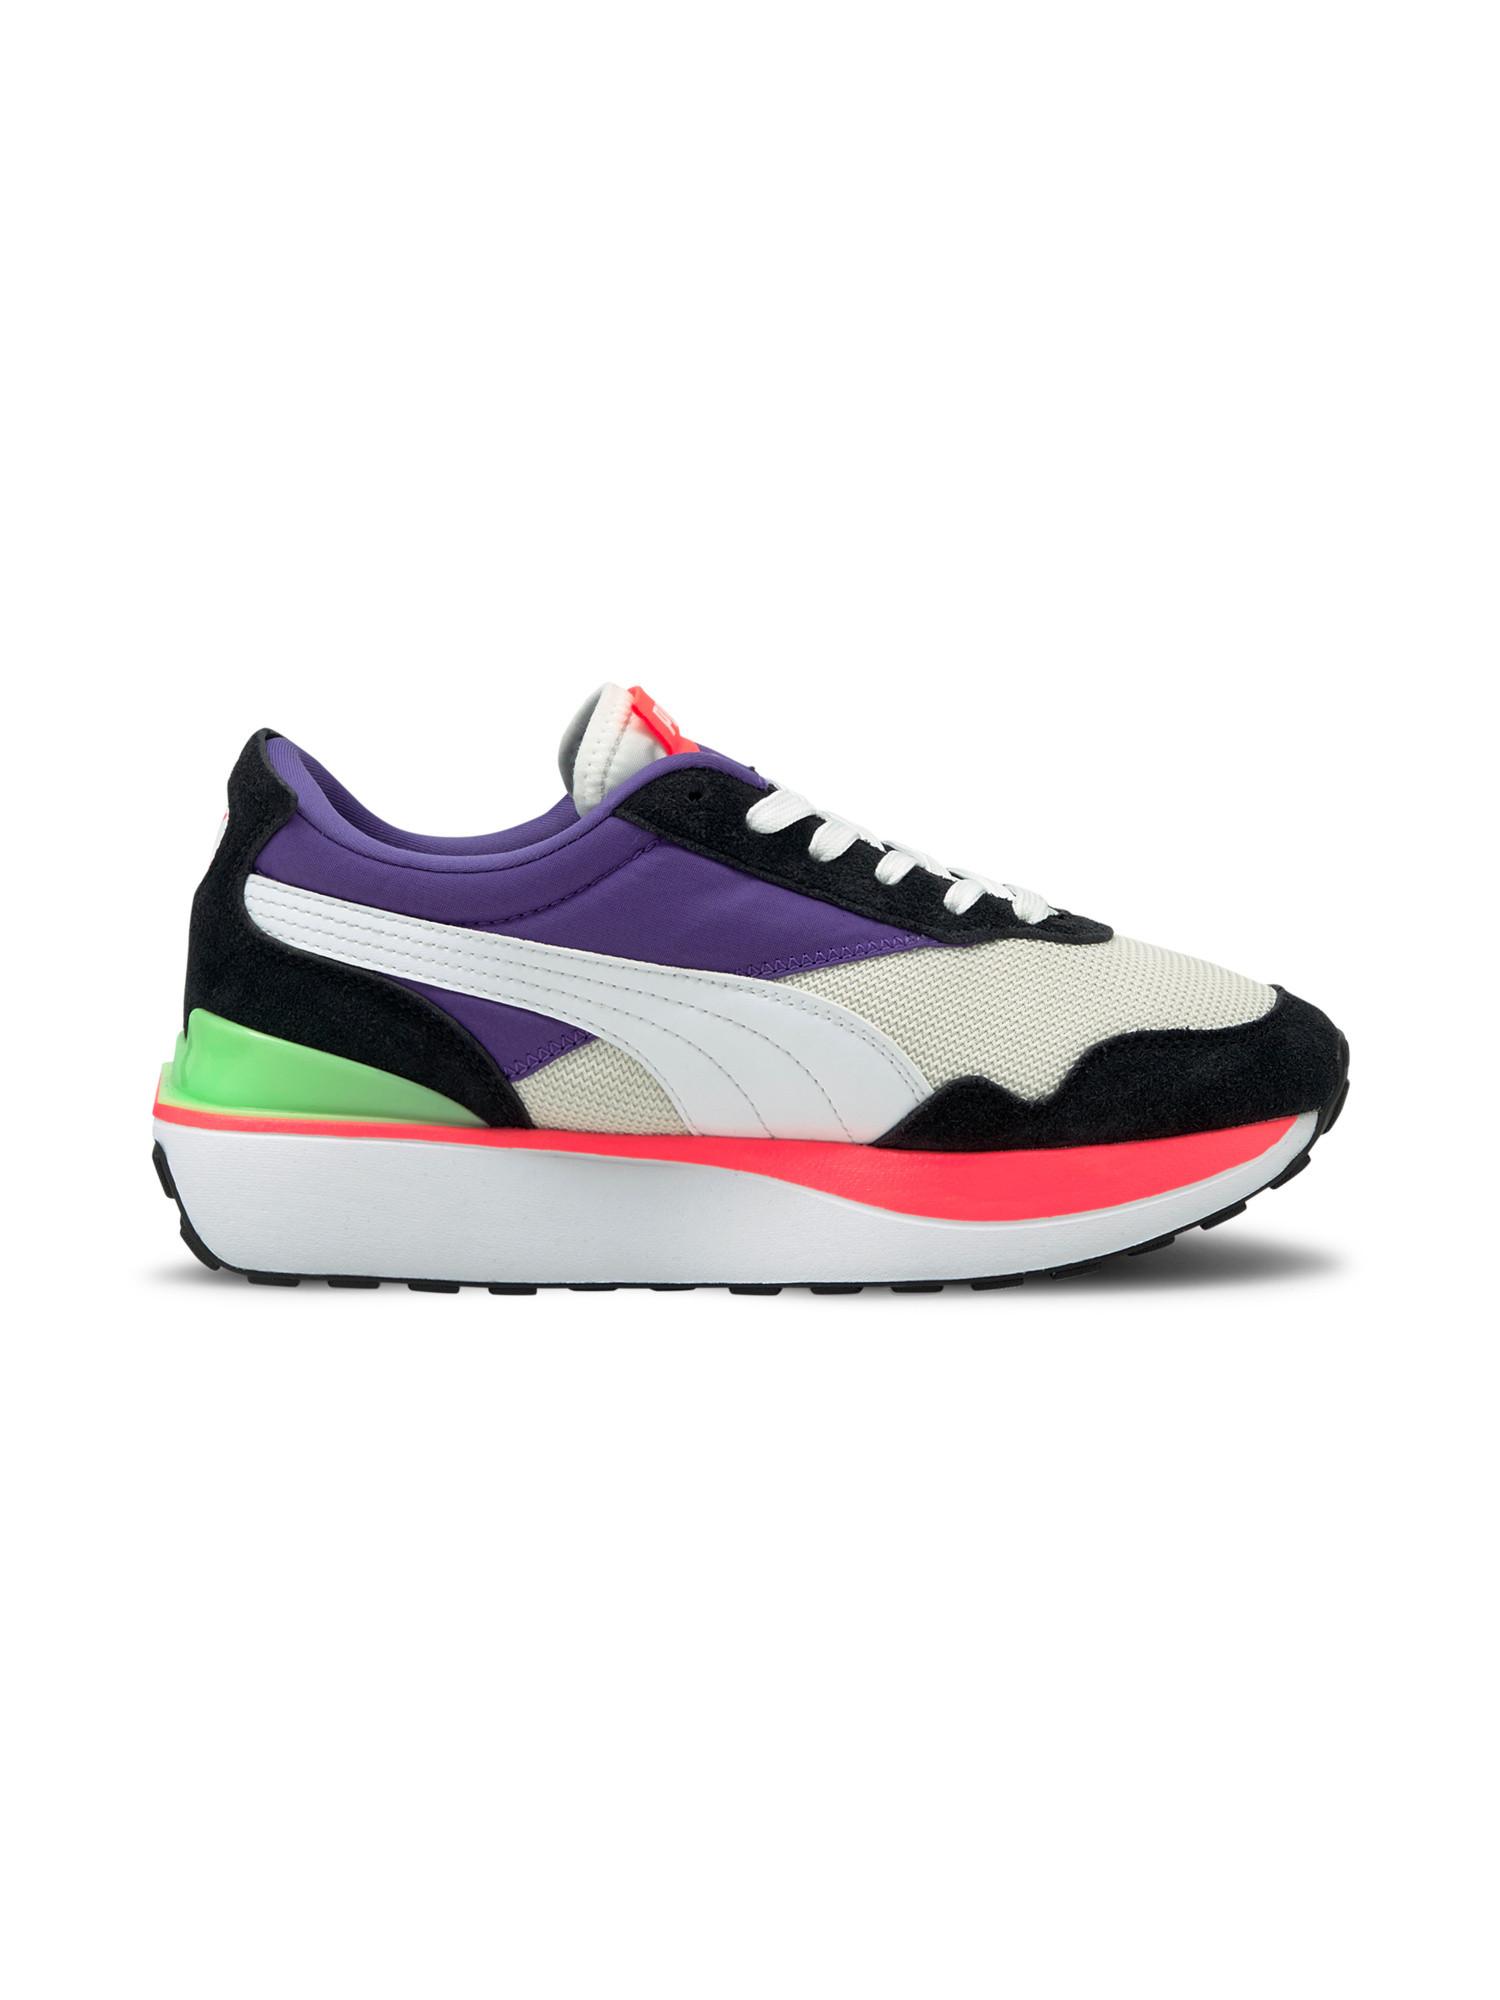 Sneakers Oslo Maya, Multicolor, large image number 1